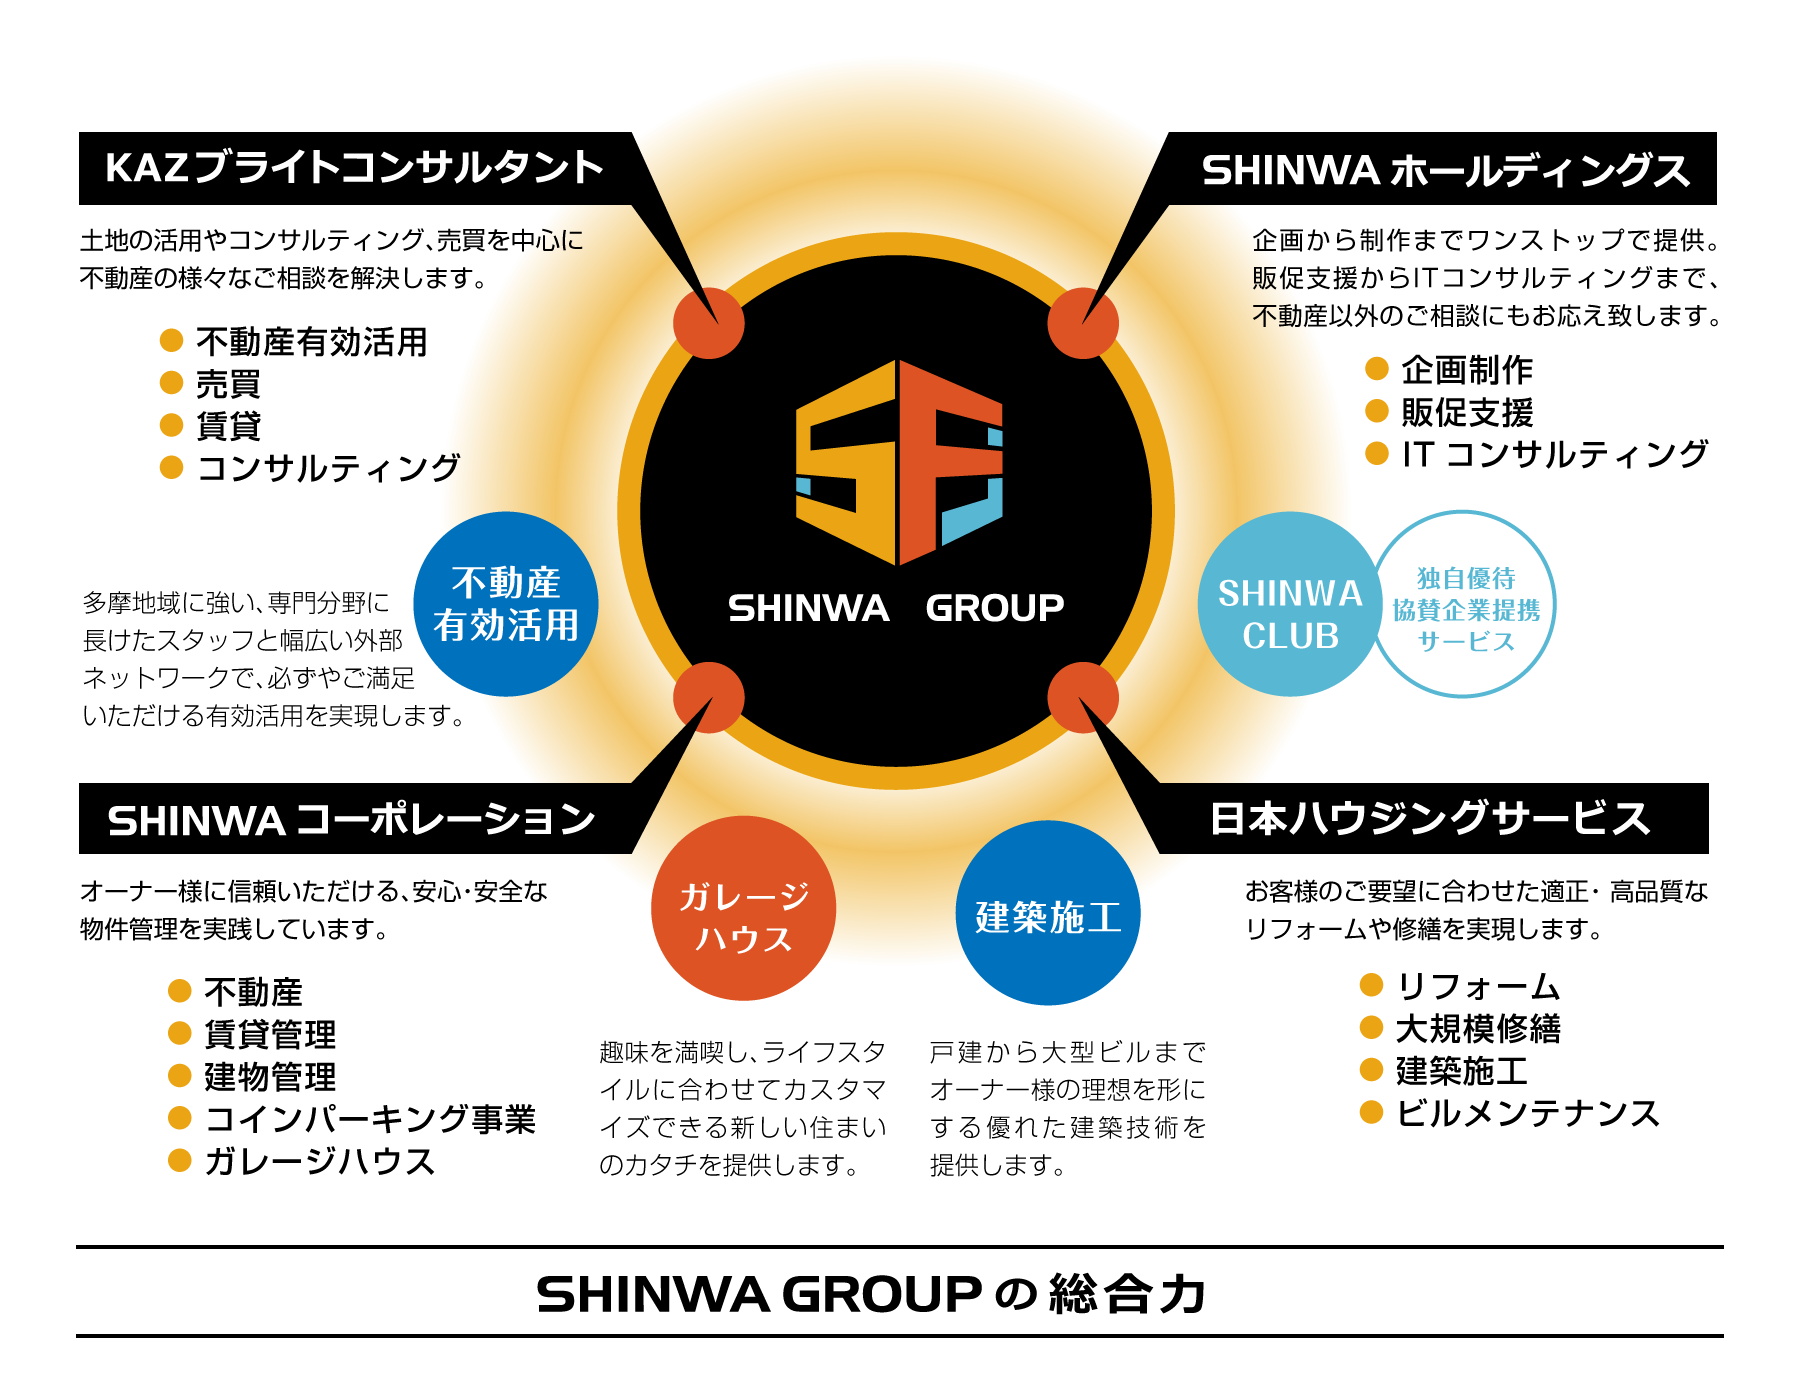 SHINWA GROUPの総合力